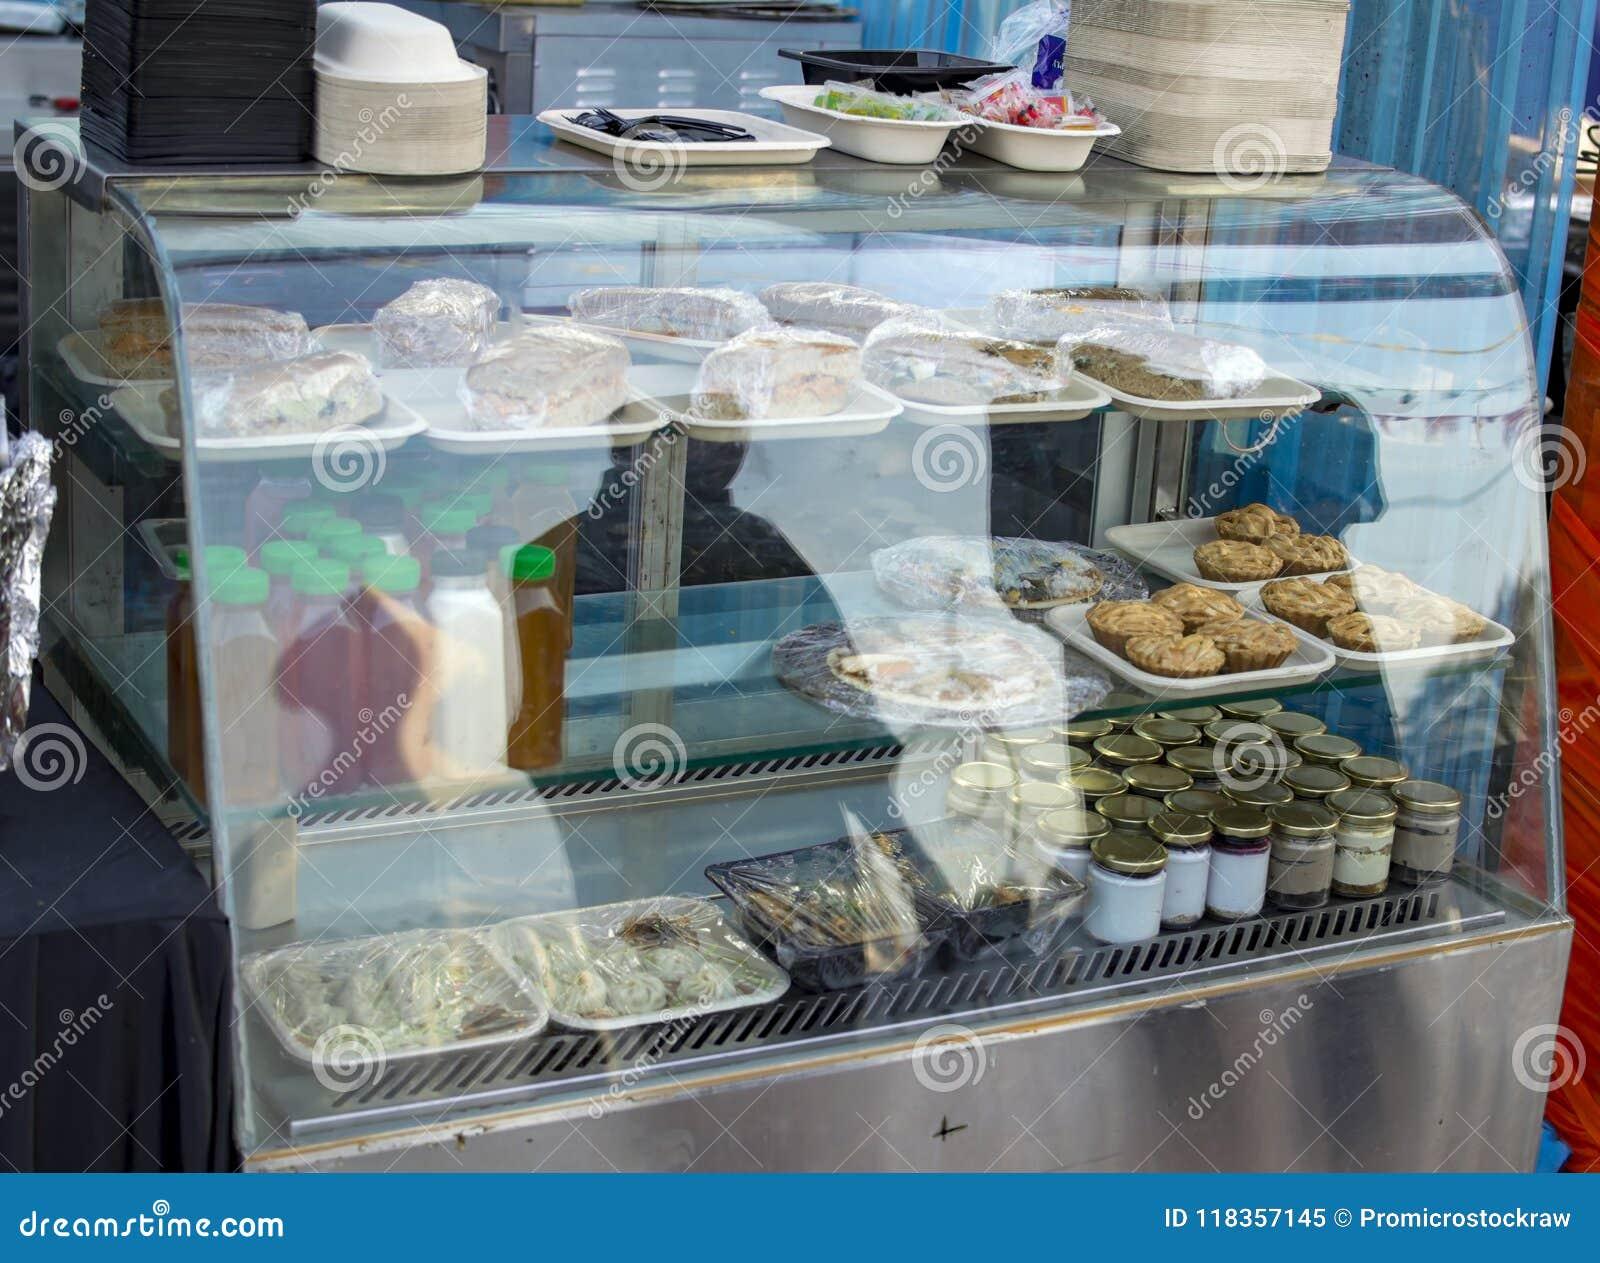 Junk food coin shop usa : Securecoin forum 90